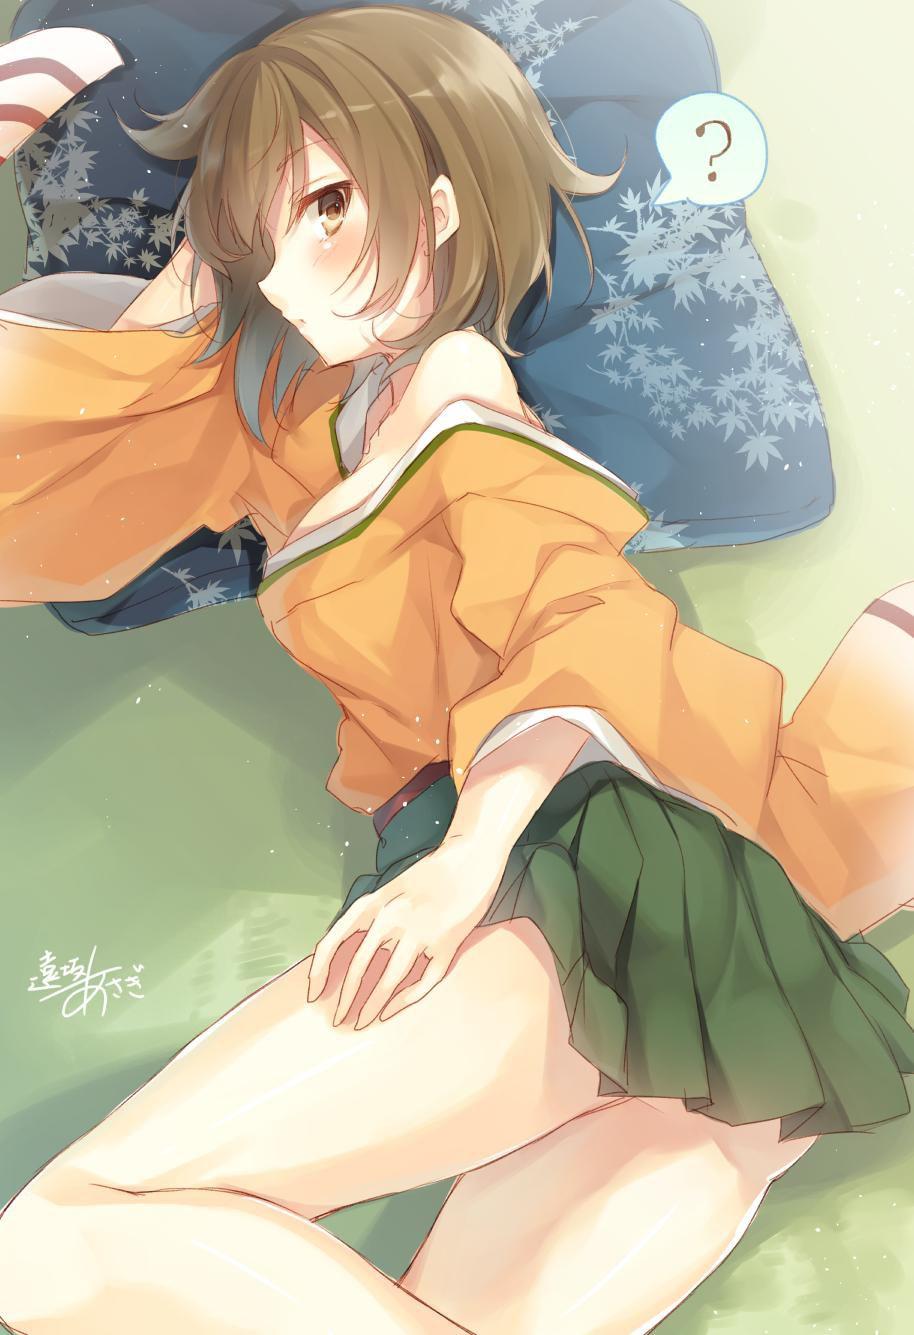 hiryuu_(kantai_collection)139